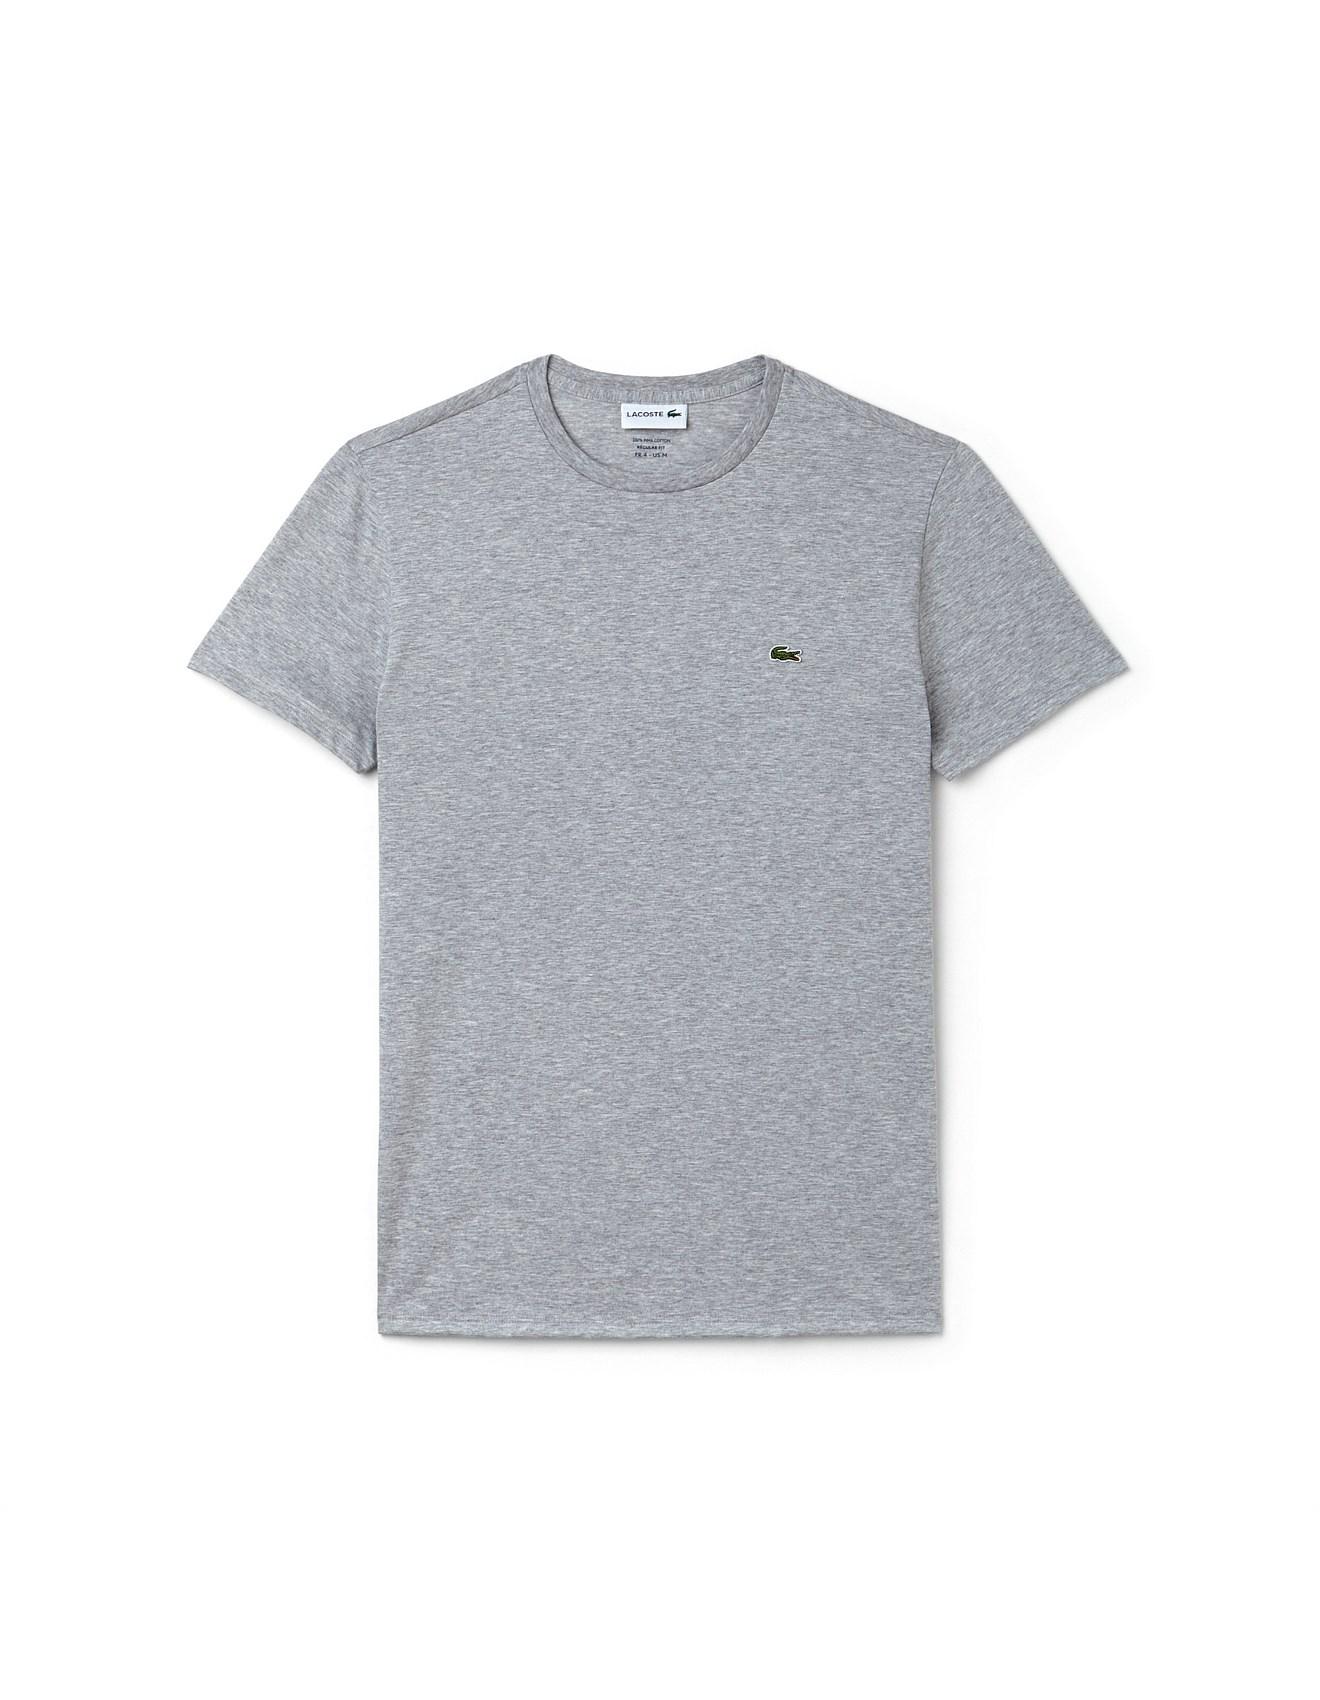 a451d7e3 Men - Basic Crew Neck Pima Tshirt